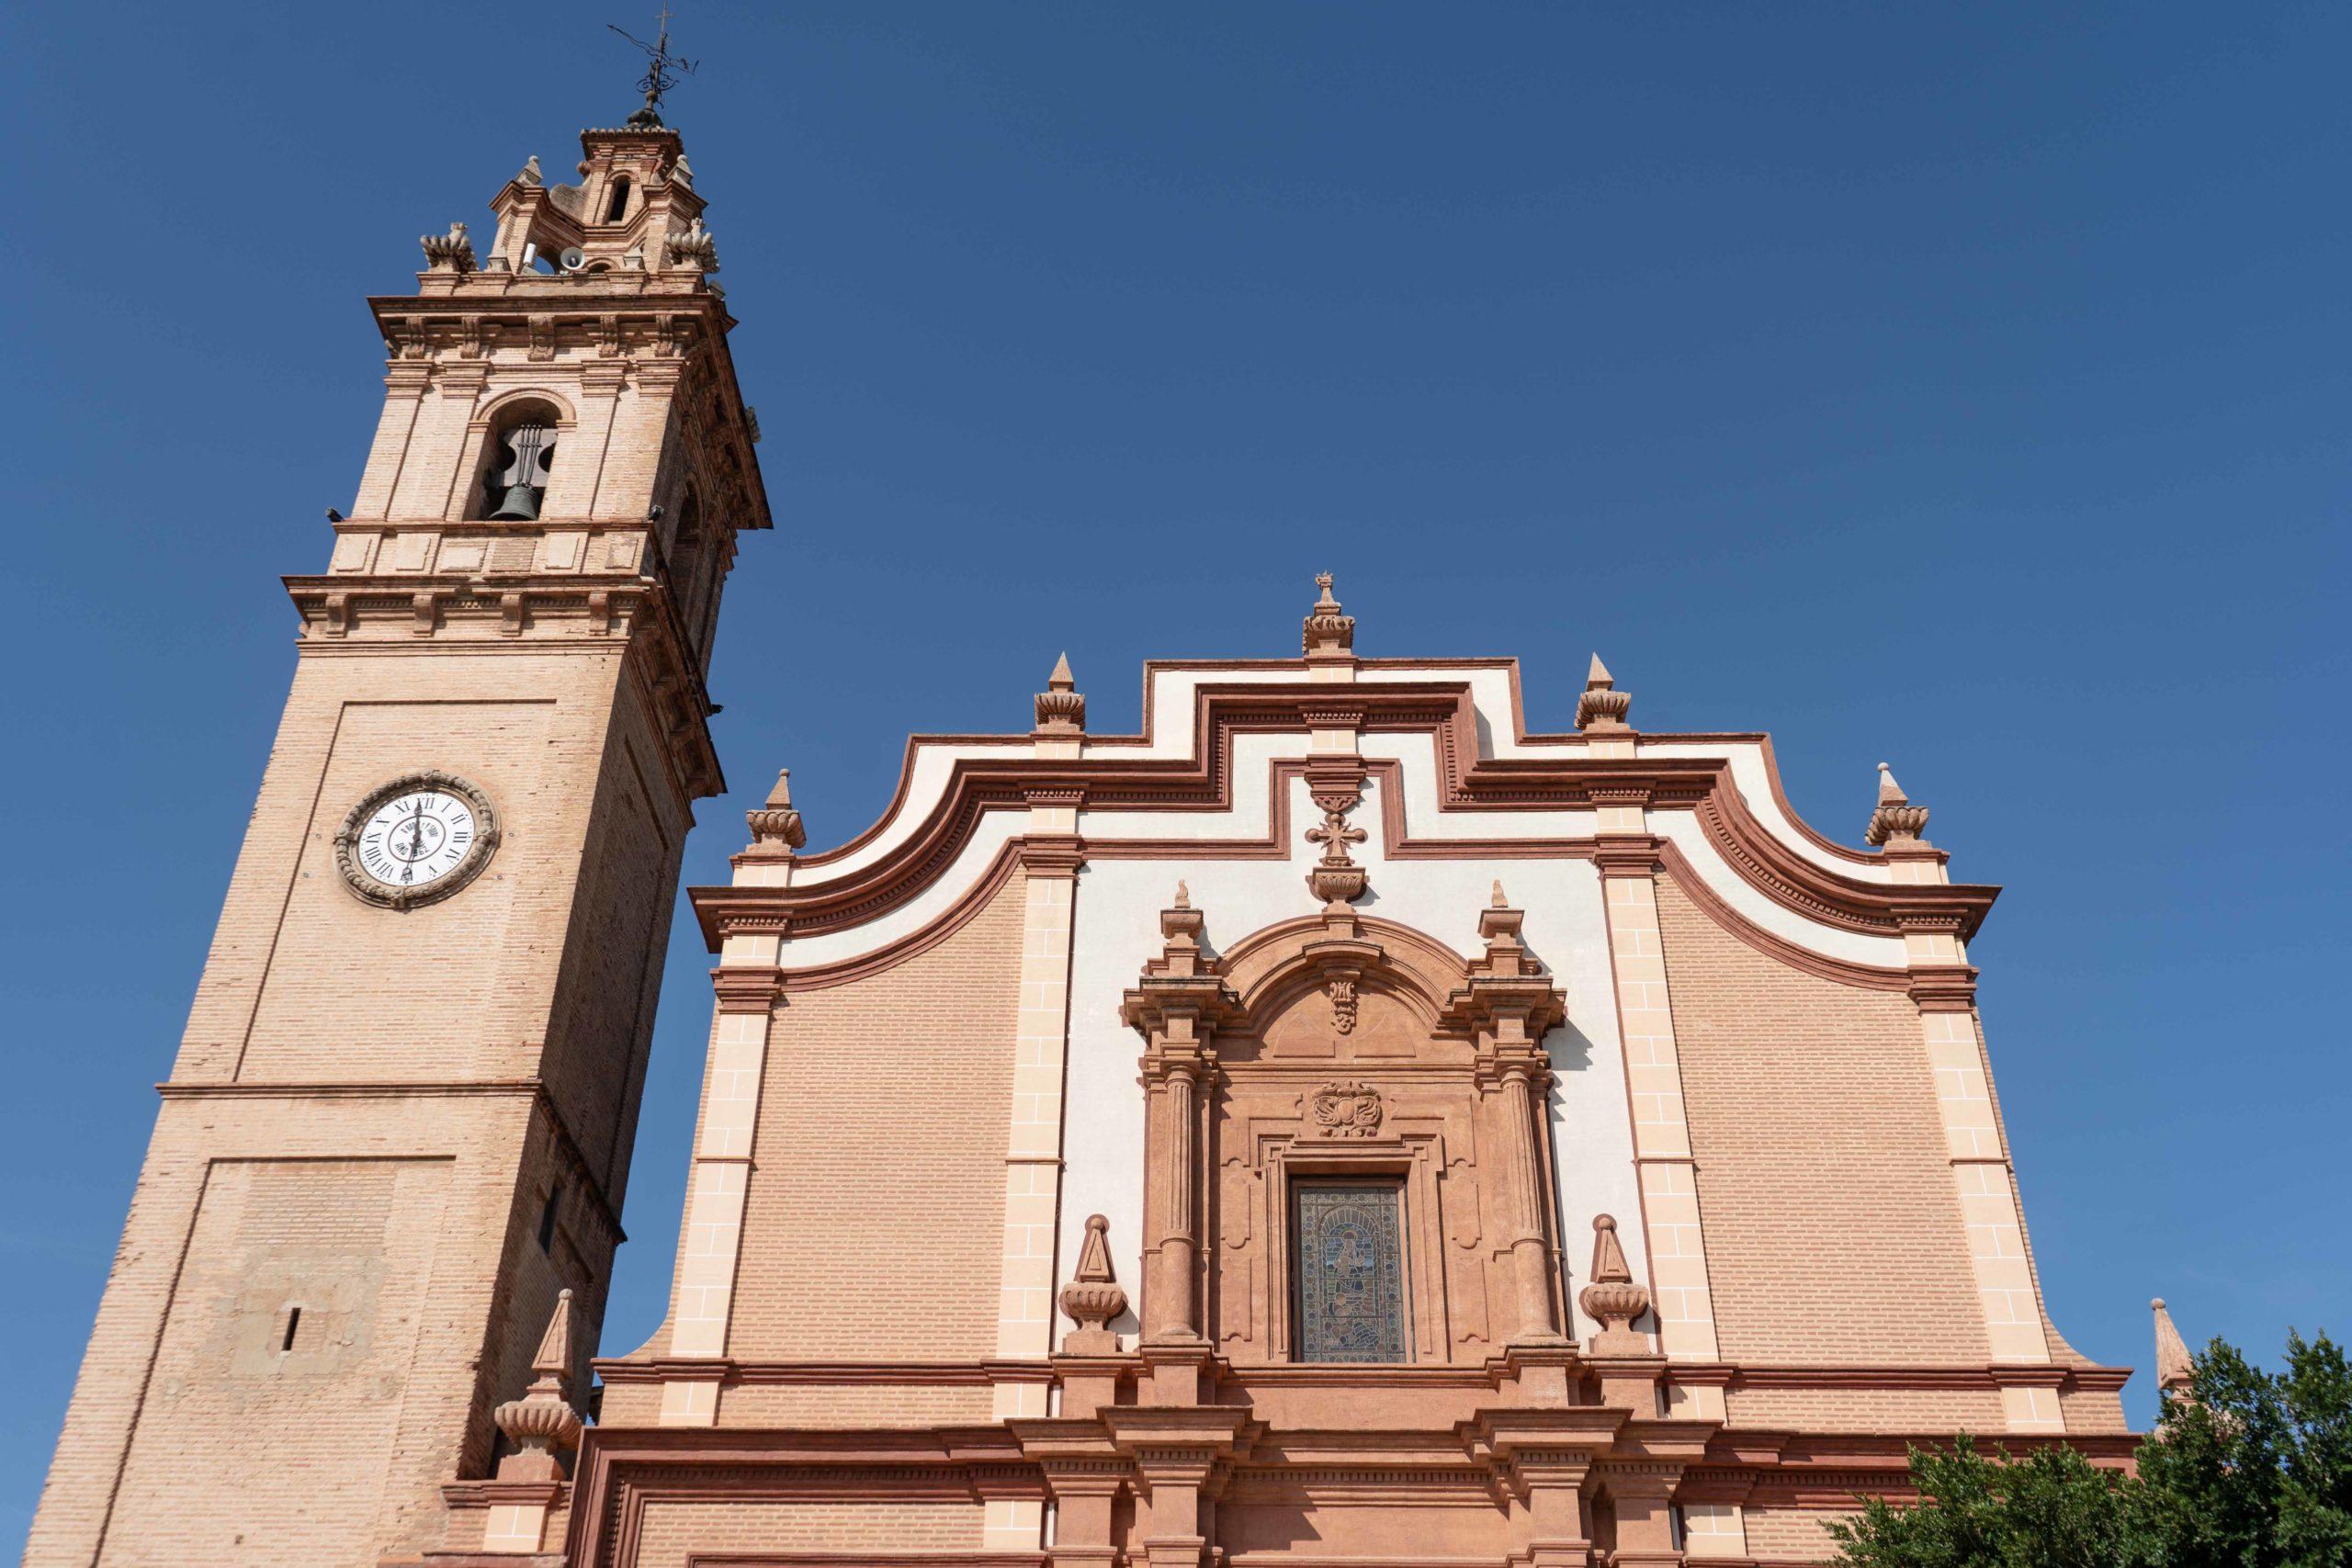 Iglesia Asunción en Foyos. Patrimonio en huerta valenciana